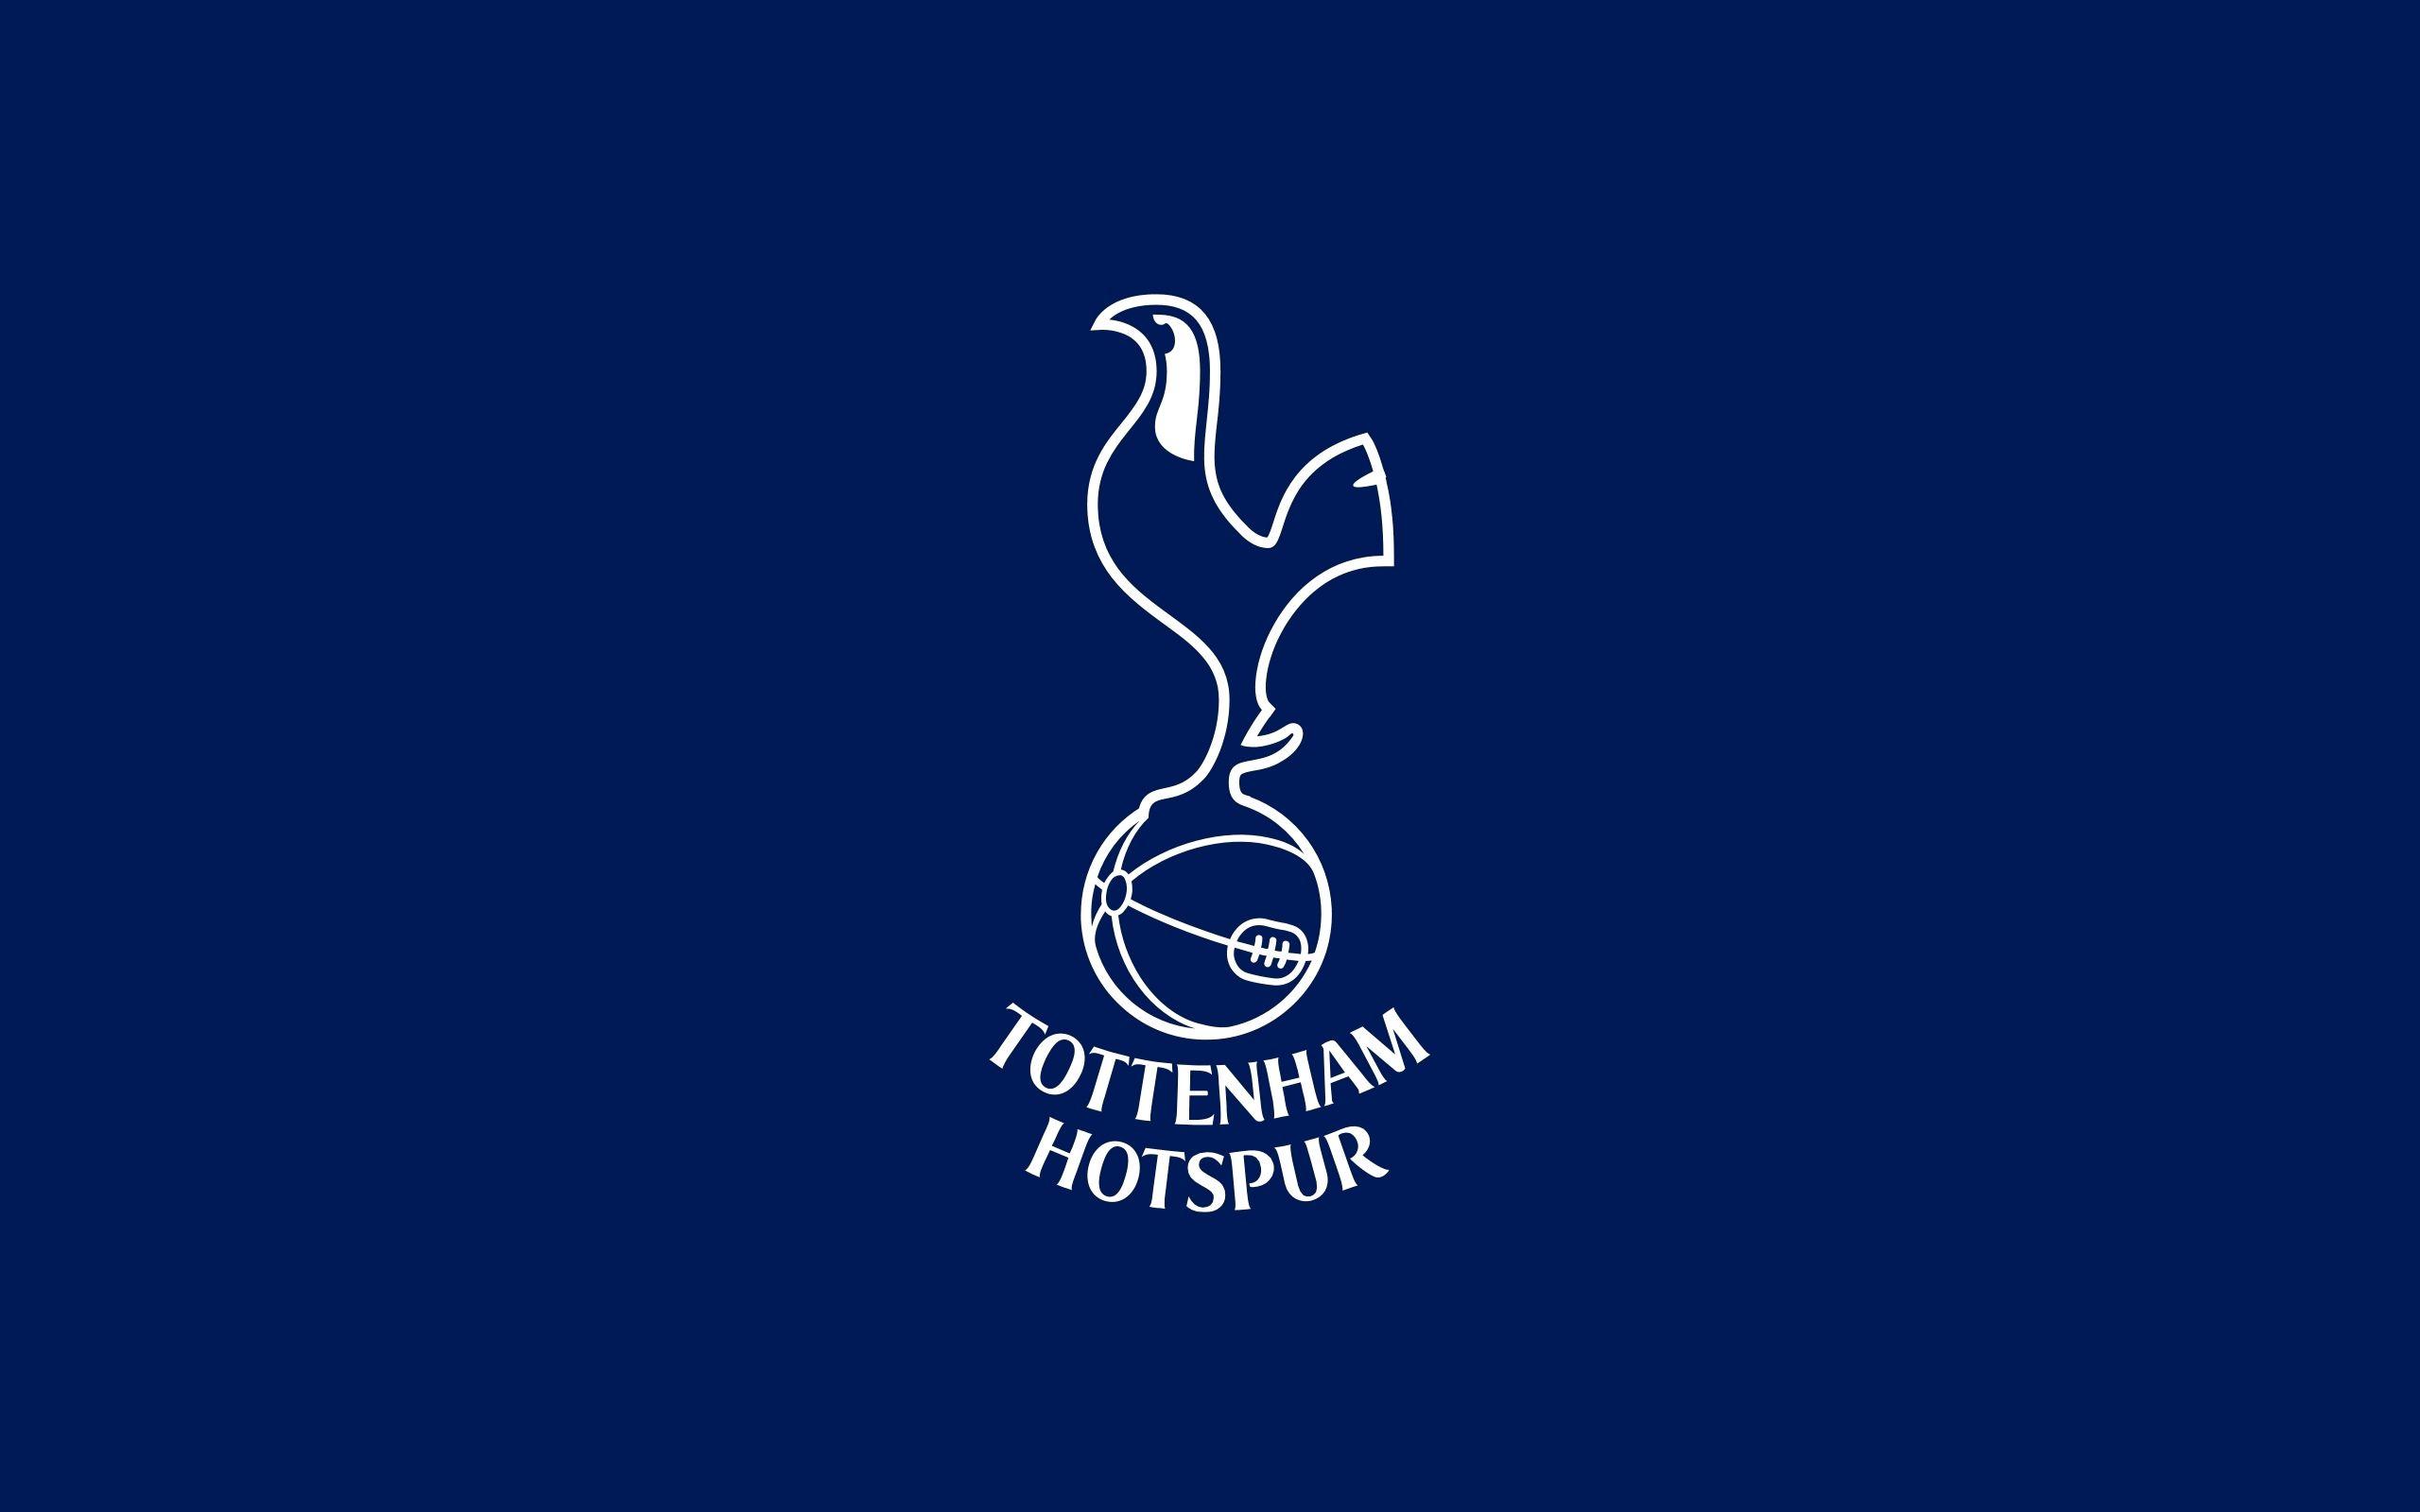 120801 download wallpaper Sports, Tottenham Hotspur, Football, Logo, Logotype, Tottenham, London screensavers and pictures for free